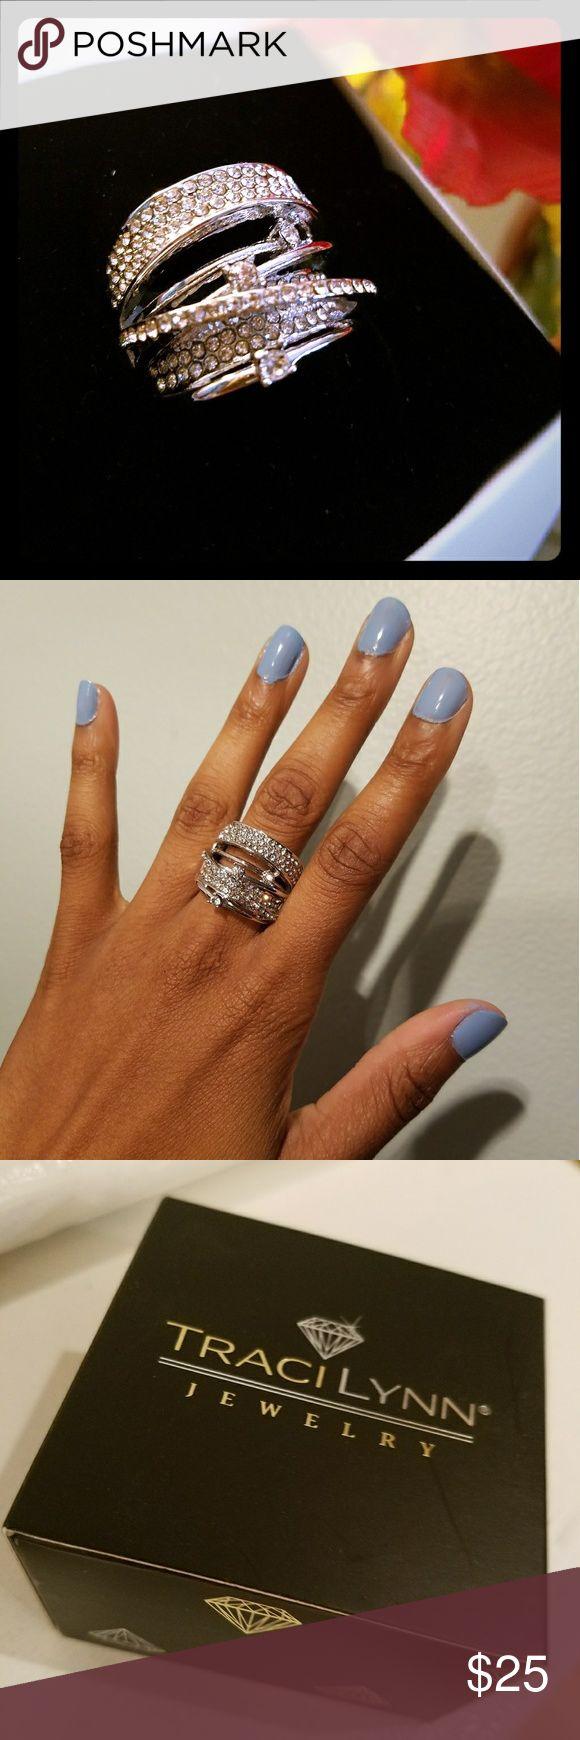 "Tracilynn Diva Stretch Ring Brand new, never worn! ""Diva Stretch Ring"" stretches to fit your finger. Traci Lynn Jewelry Rings"